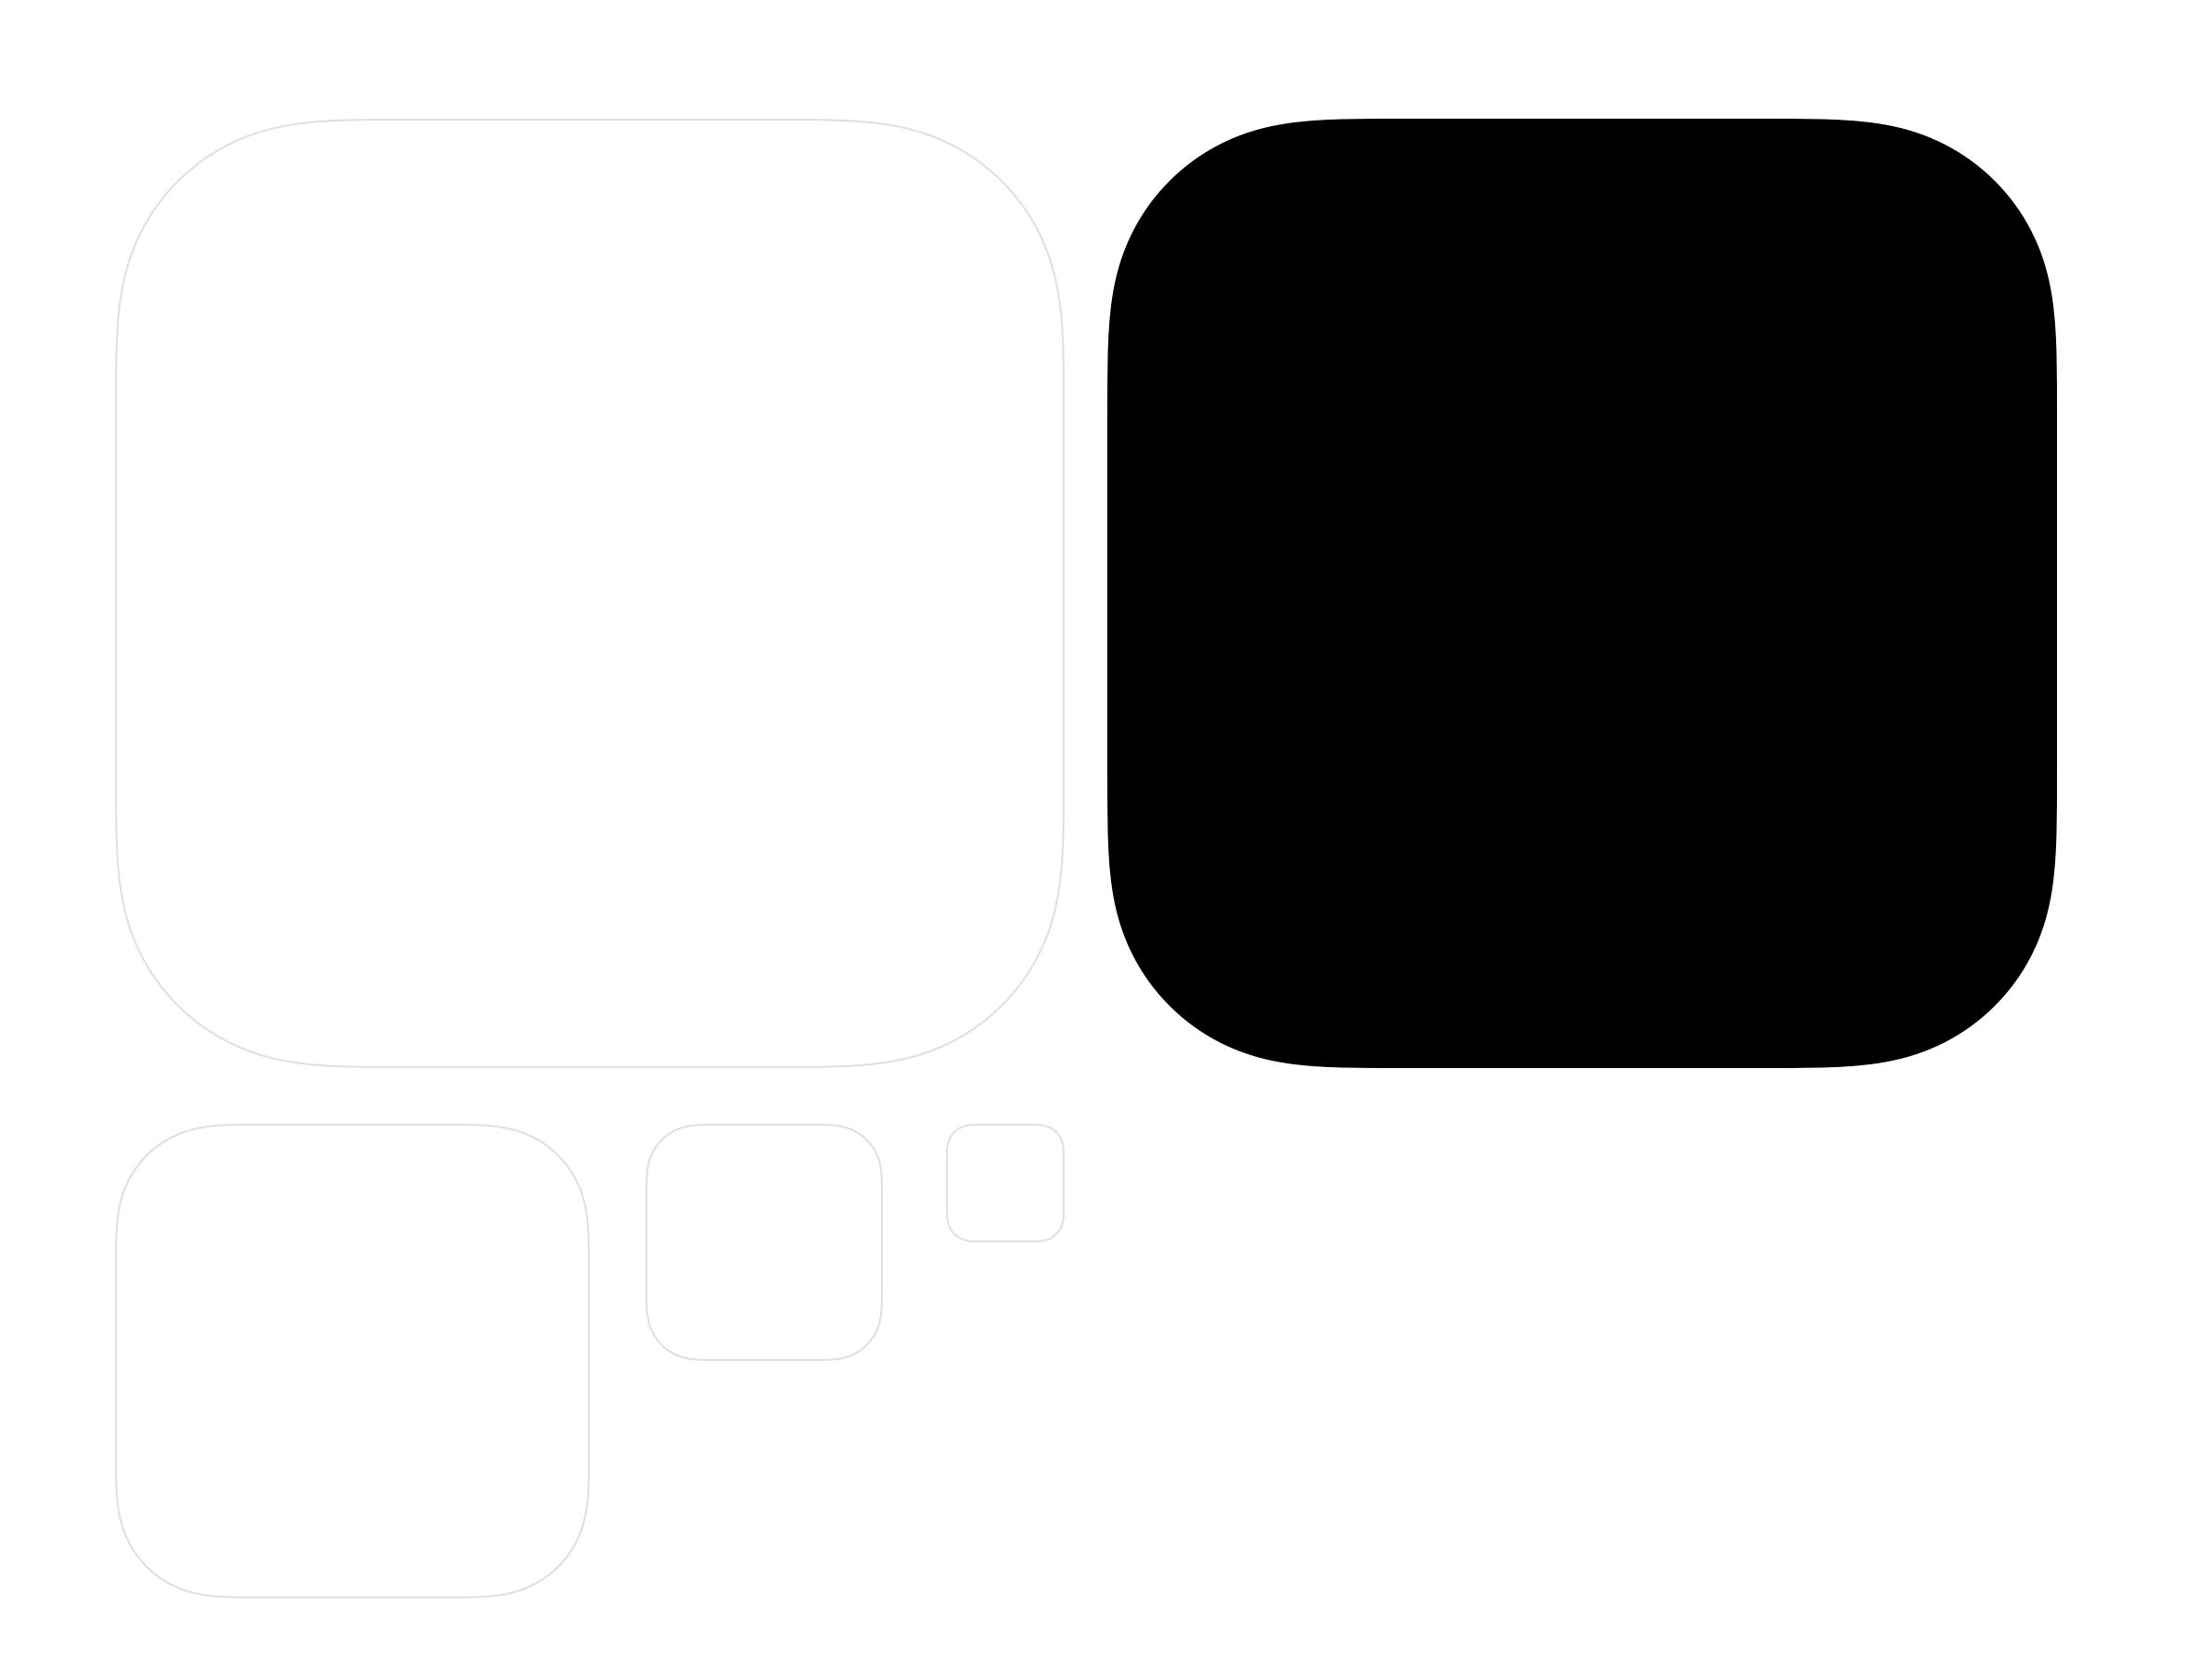 Screenshot of SVG exports